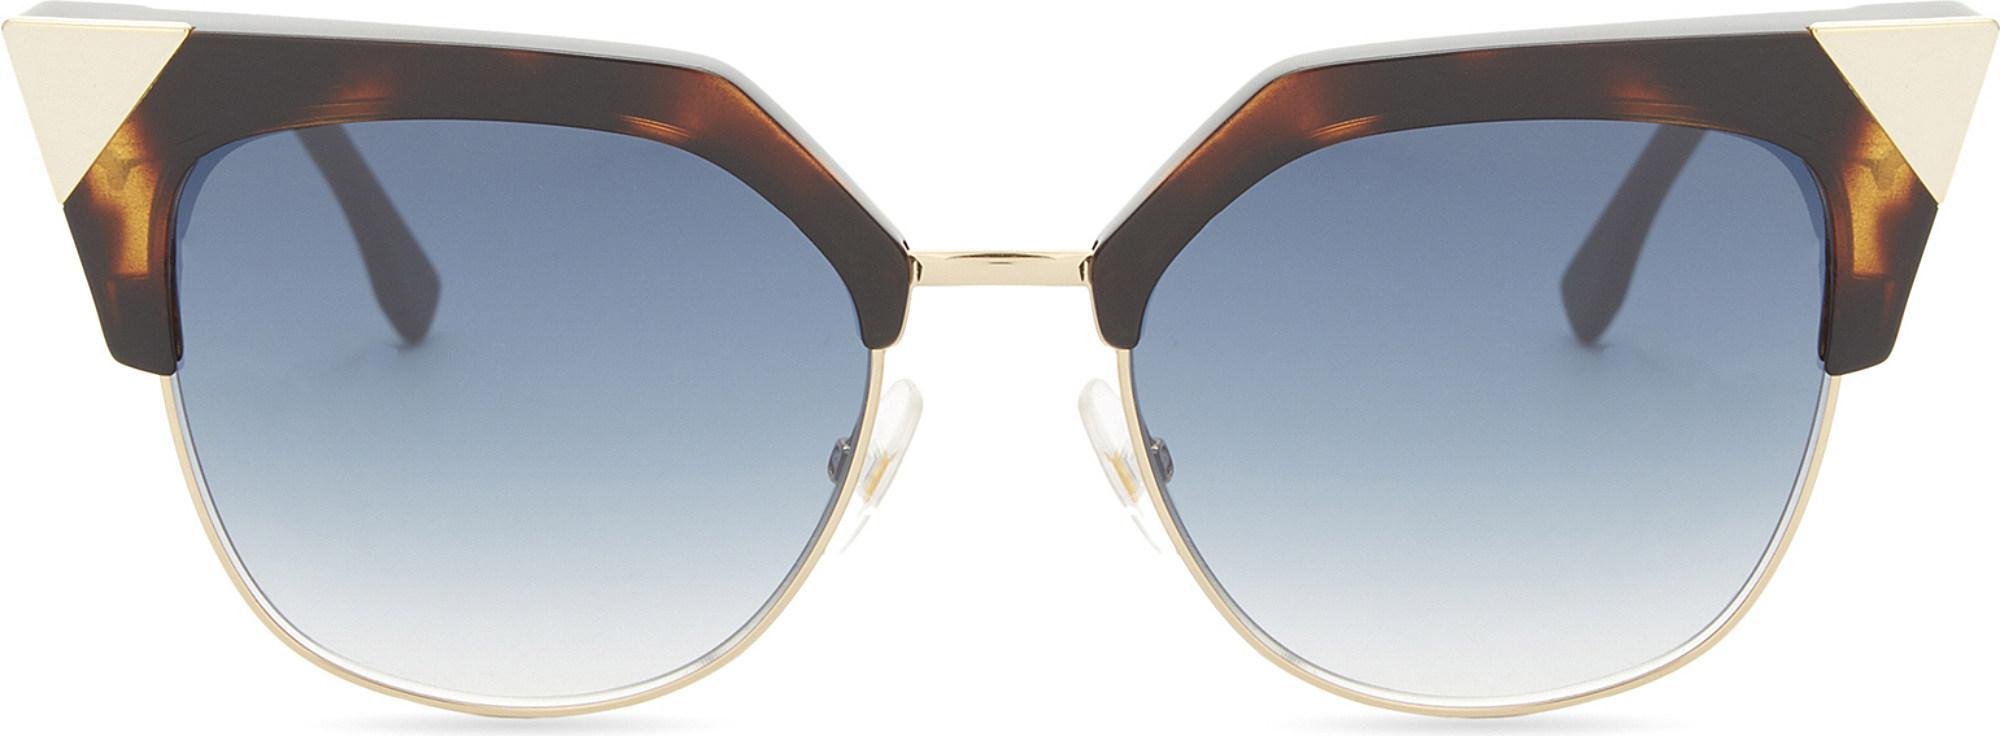 d6b486a886 Fendi. Women s Ff0149 s Iridia Cat-eye Frame Sunglasses